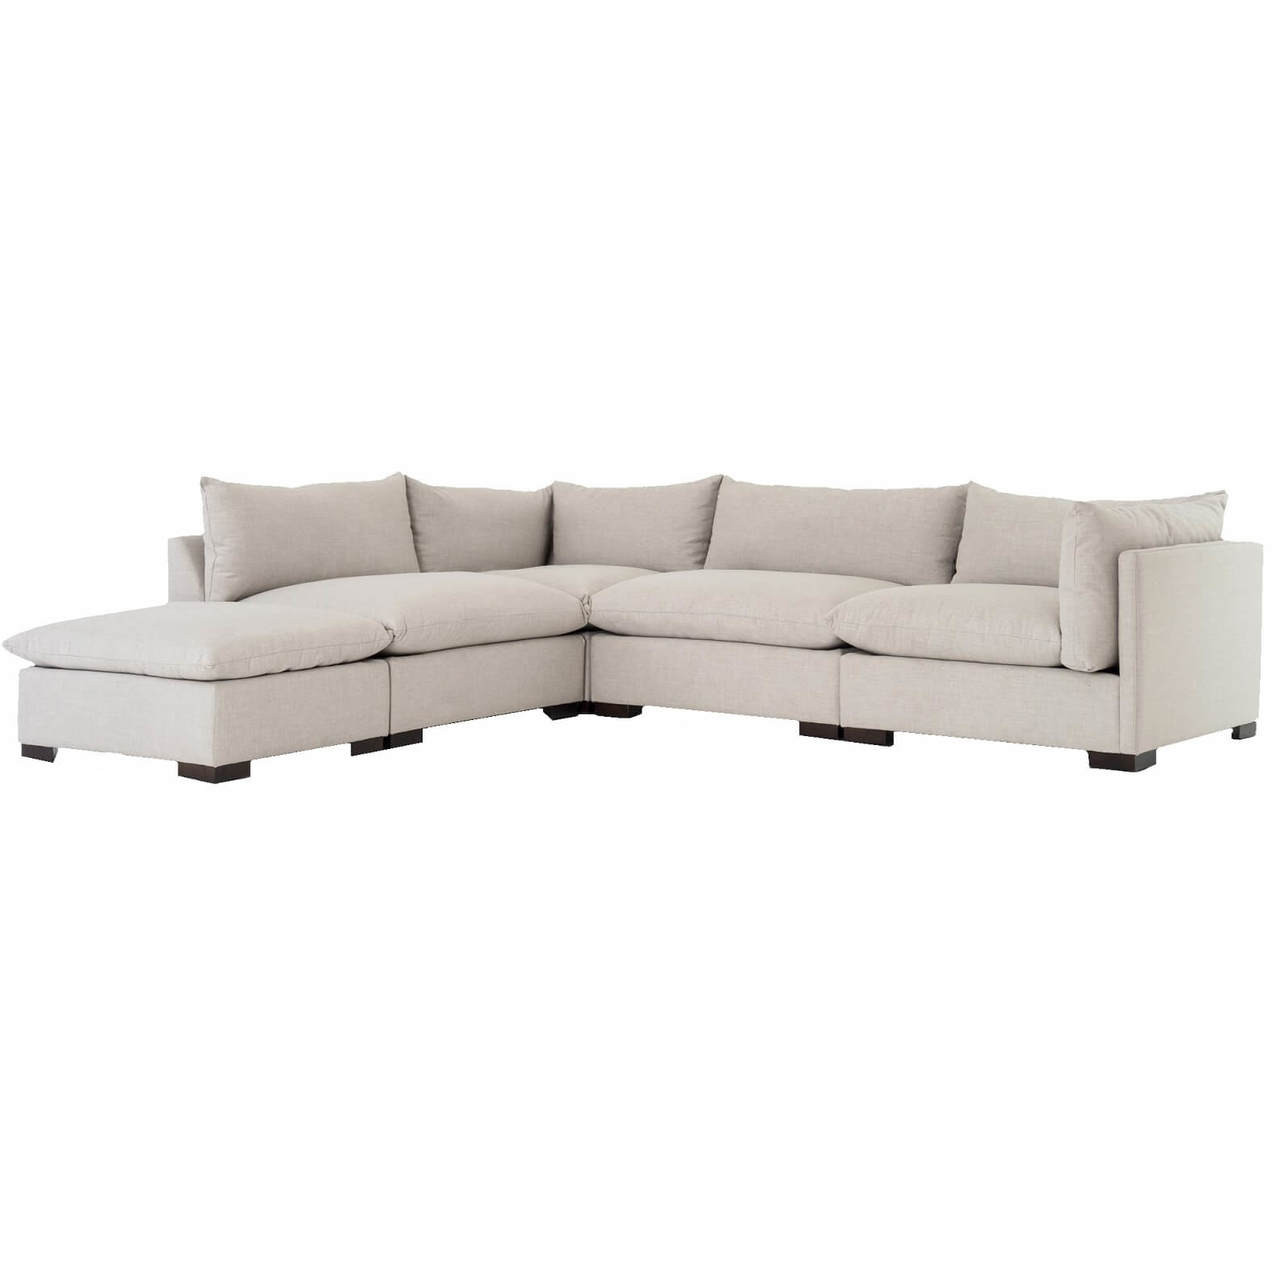 Westworld Modern Beige 5 Piece Modular Lounge Sectional Sofa